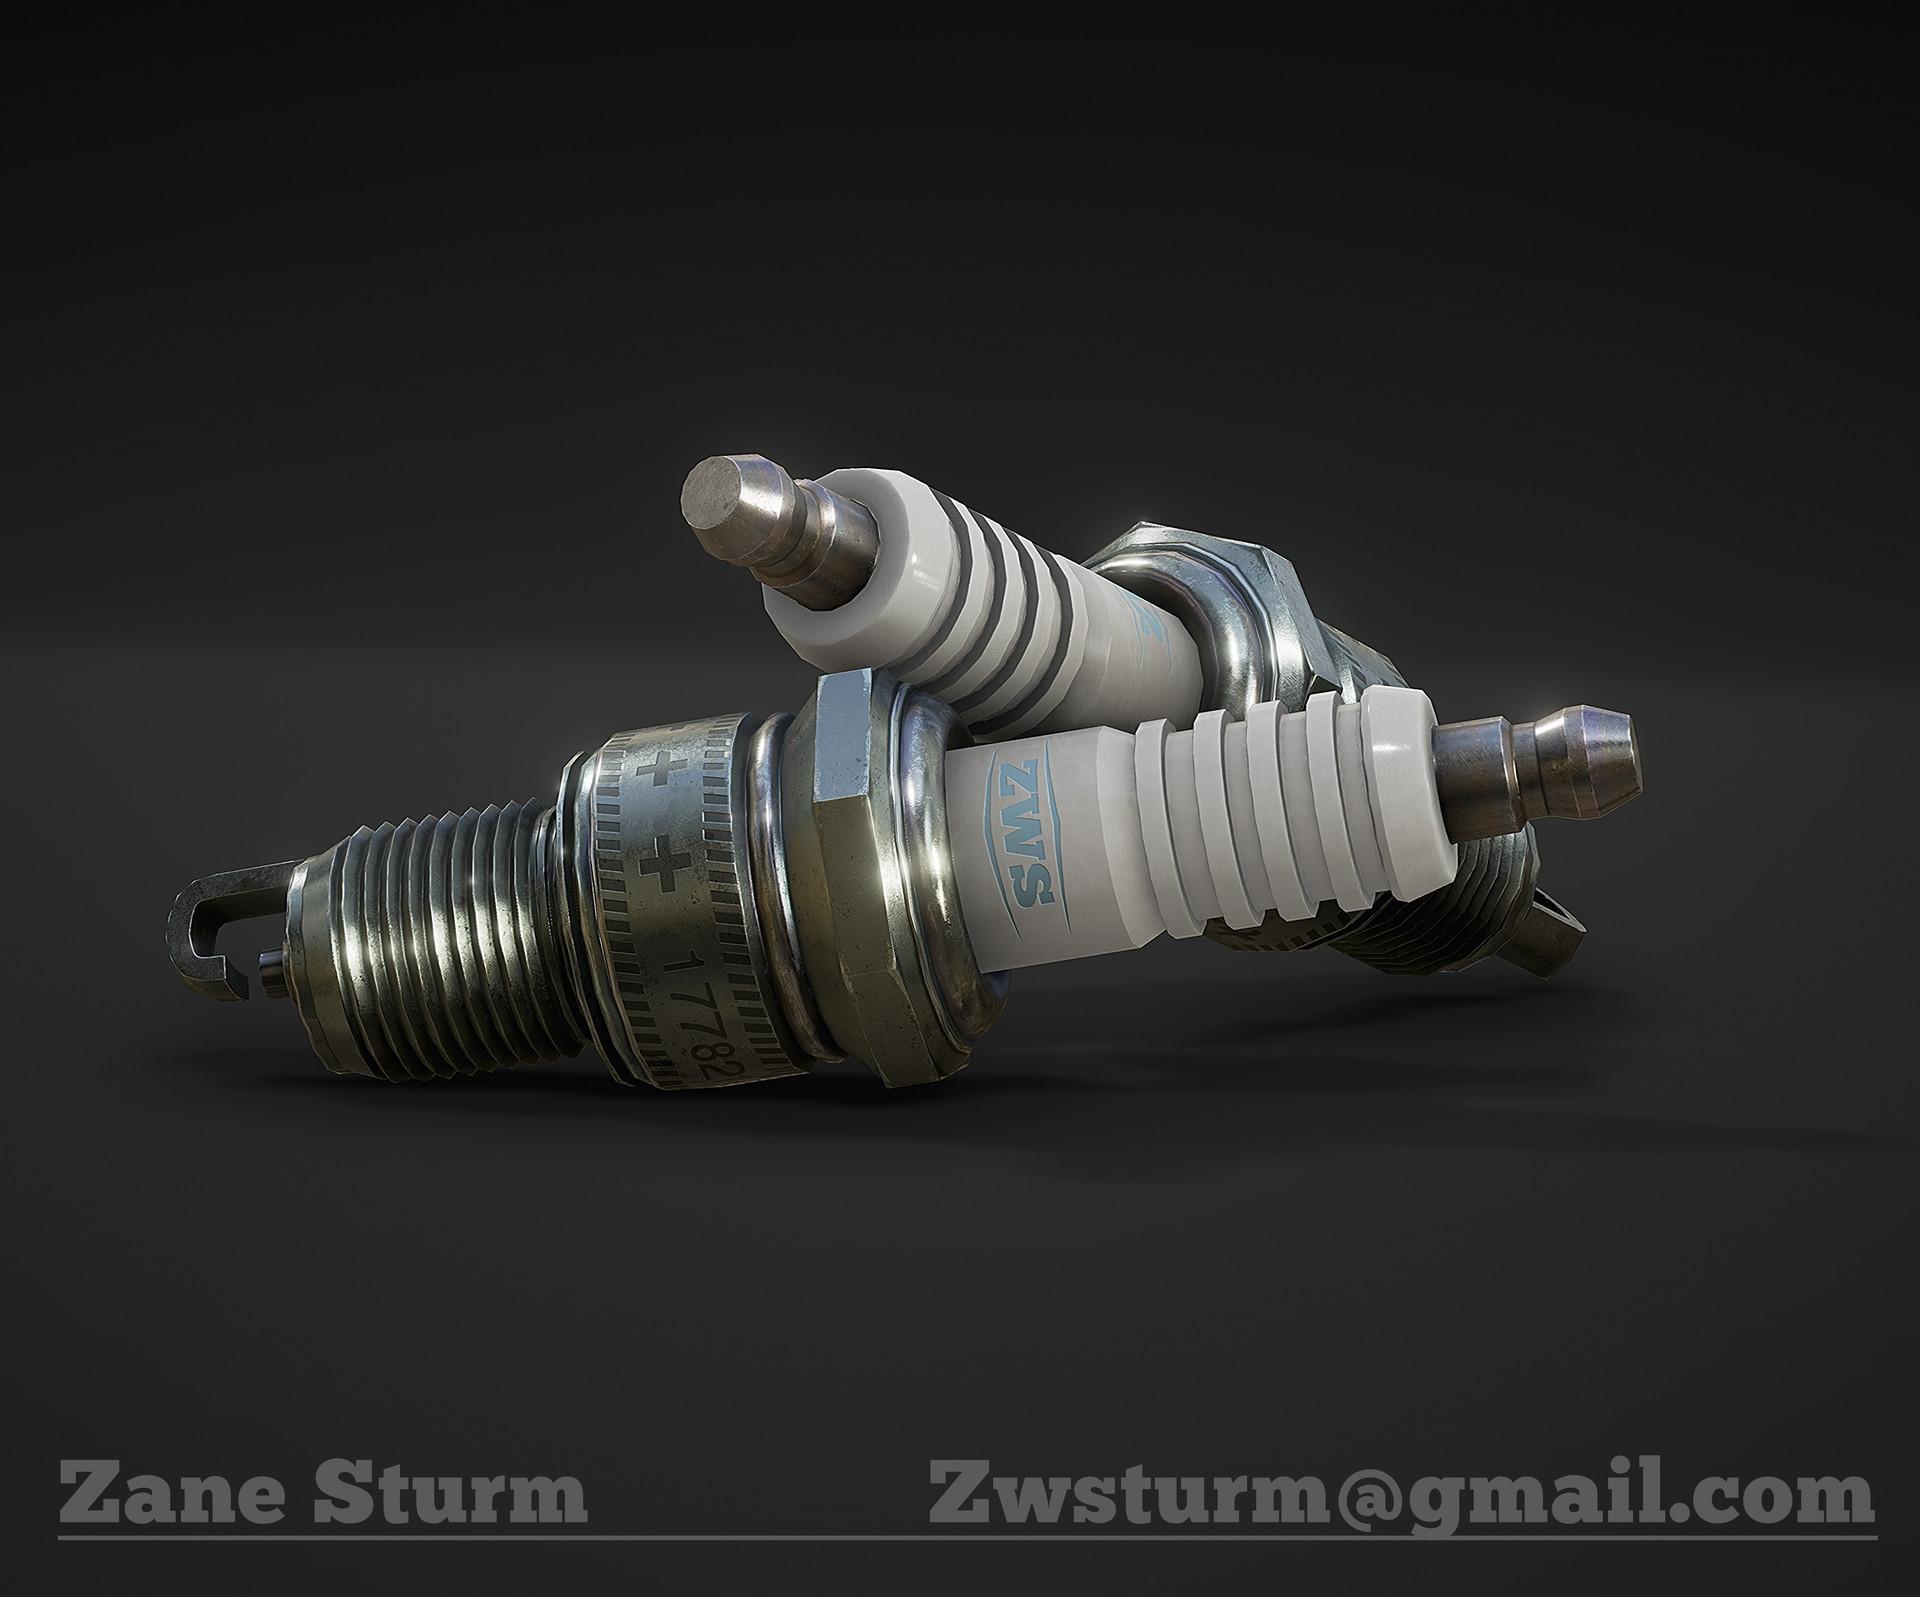 Zane sturm sparkplug beauty